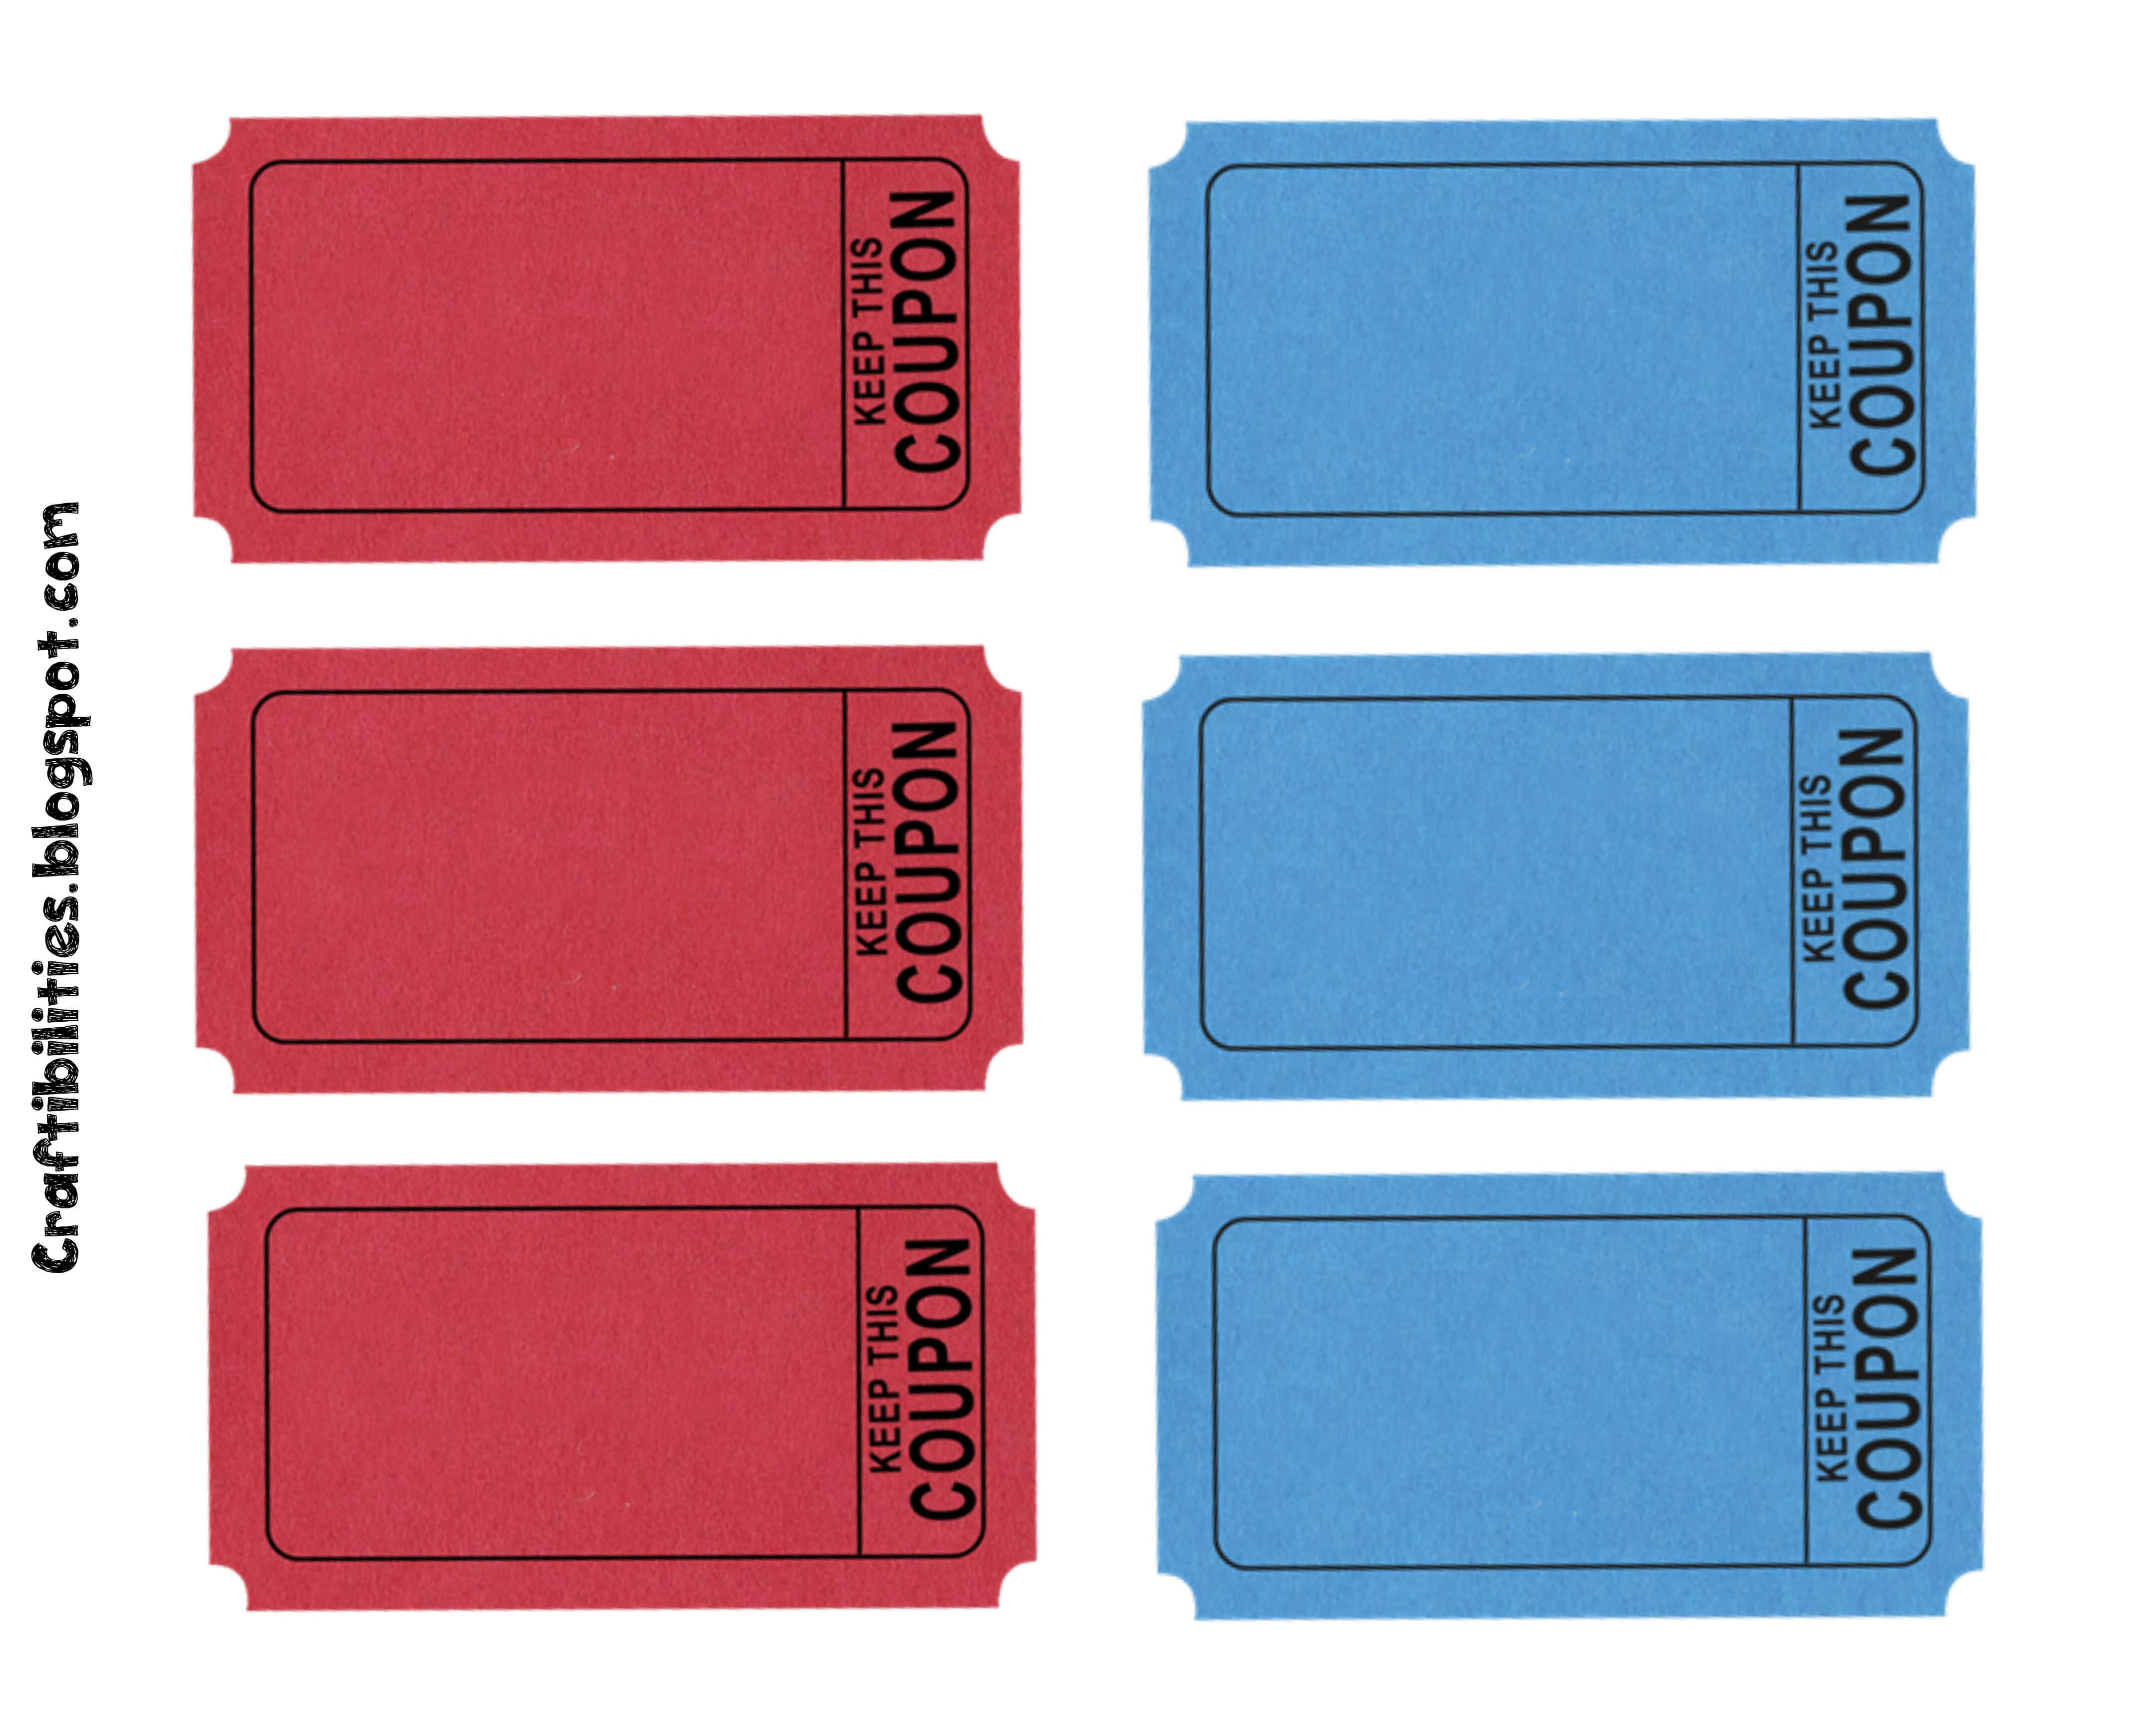 Free Printable Blank Birthday Coupons Template With Red And Inside Blank Coupon Template Printable